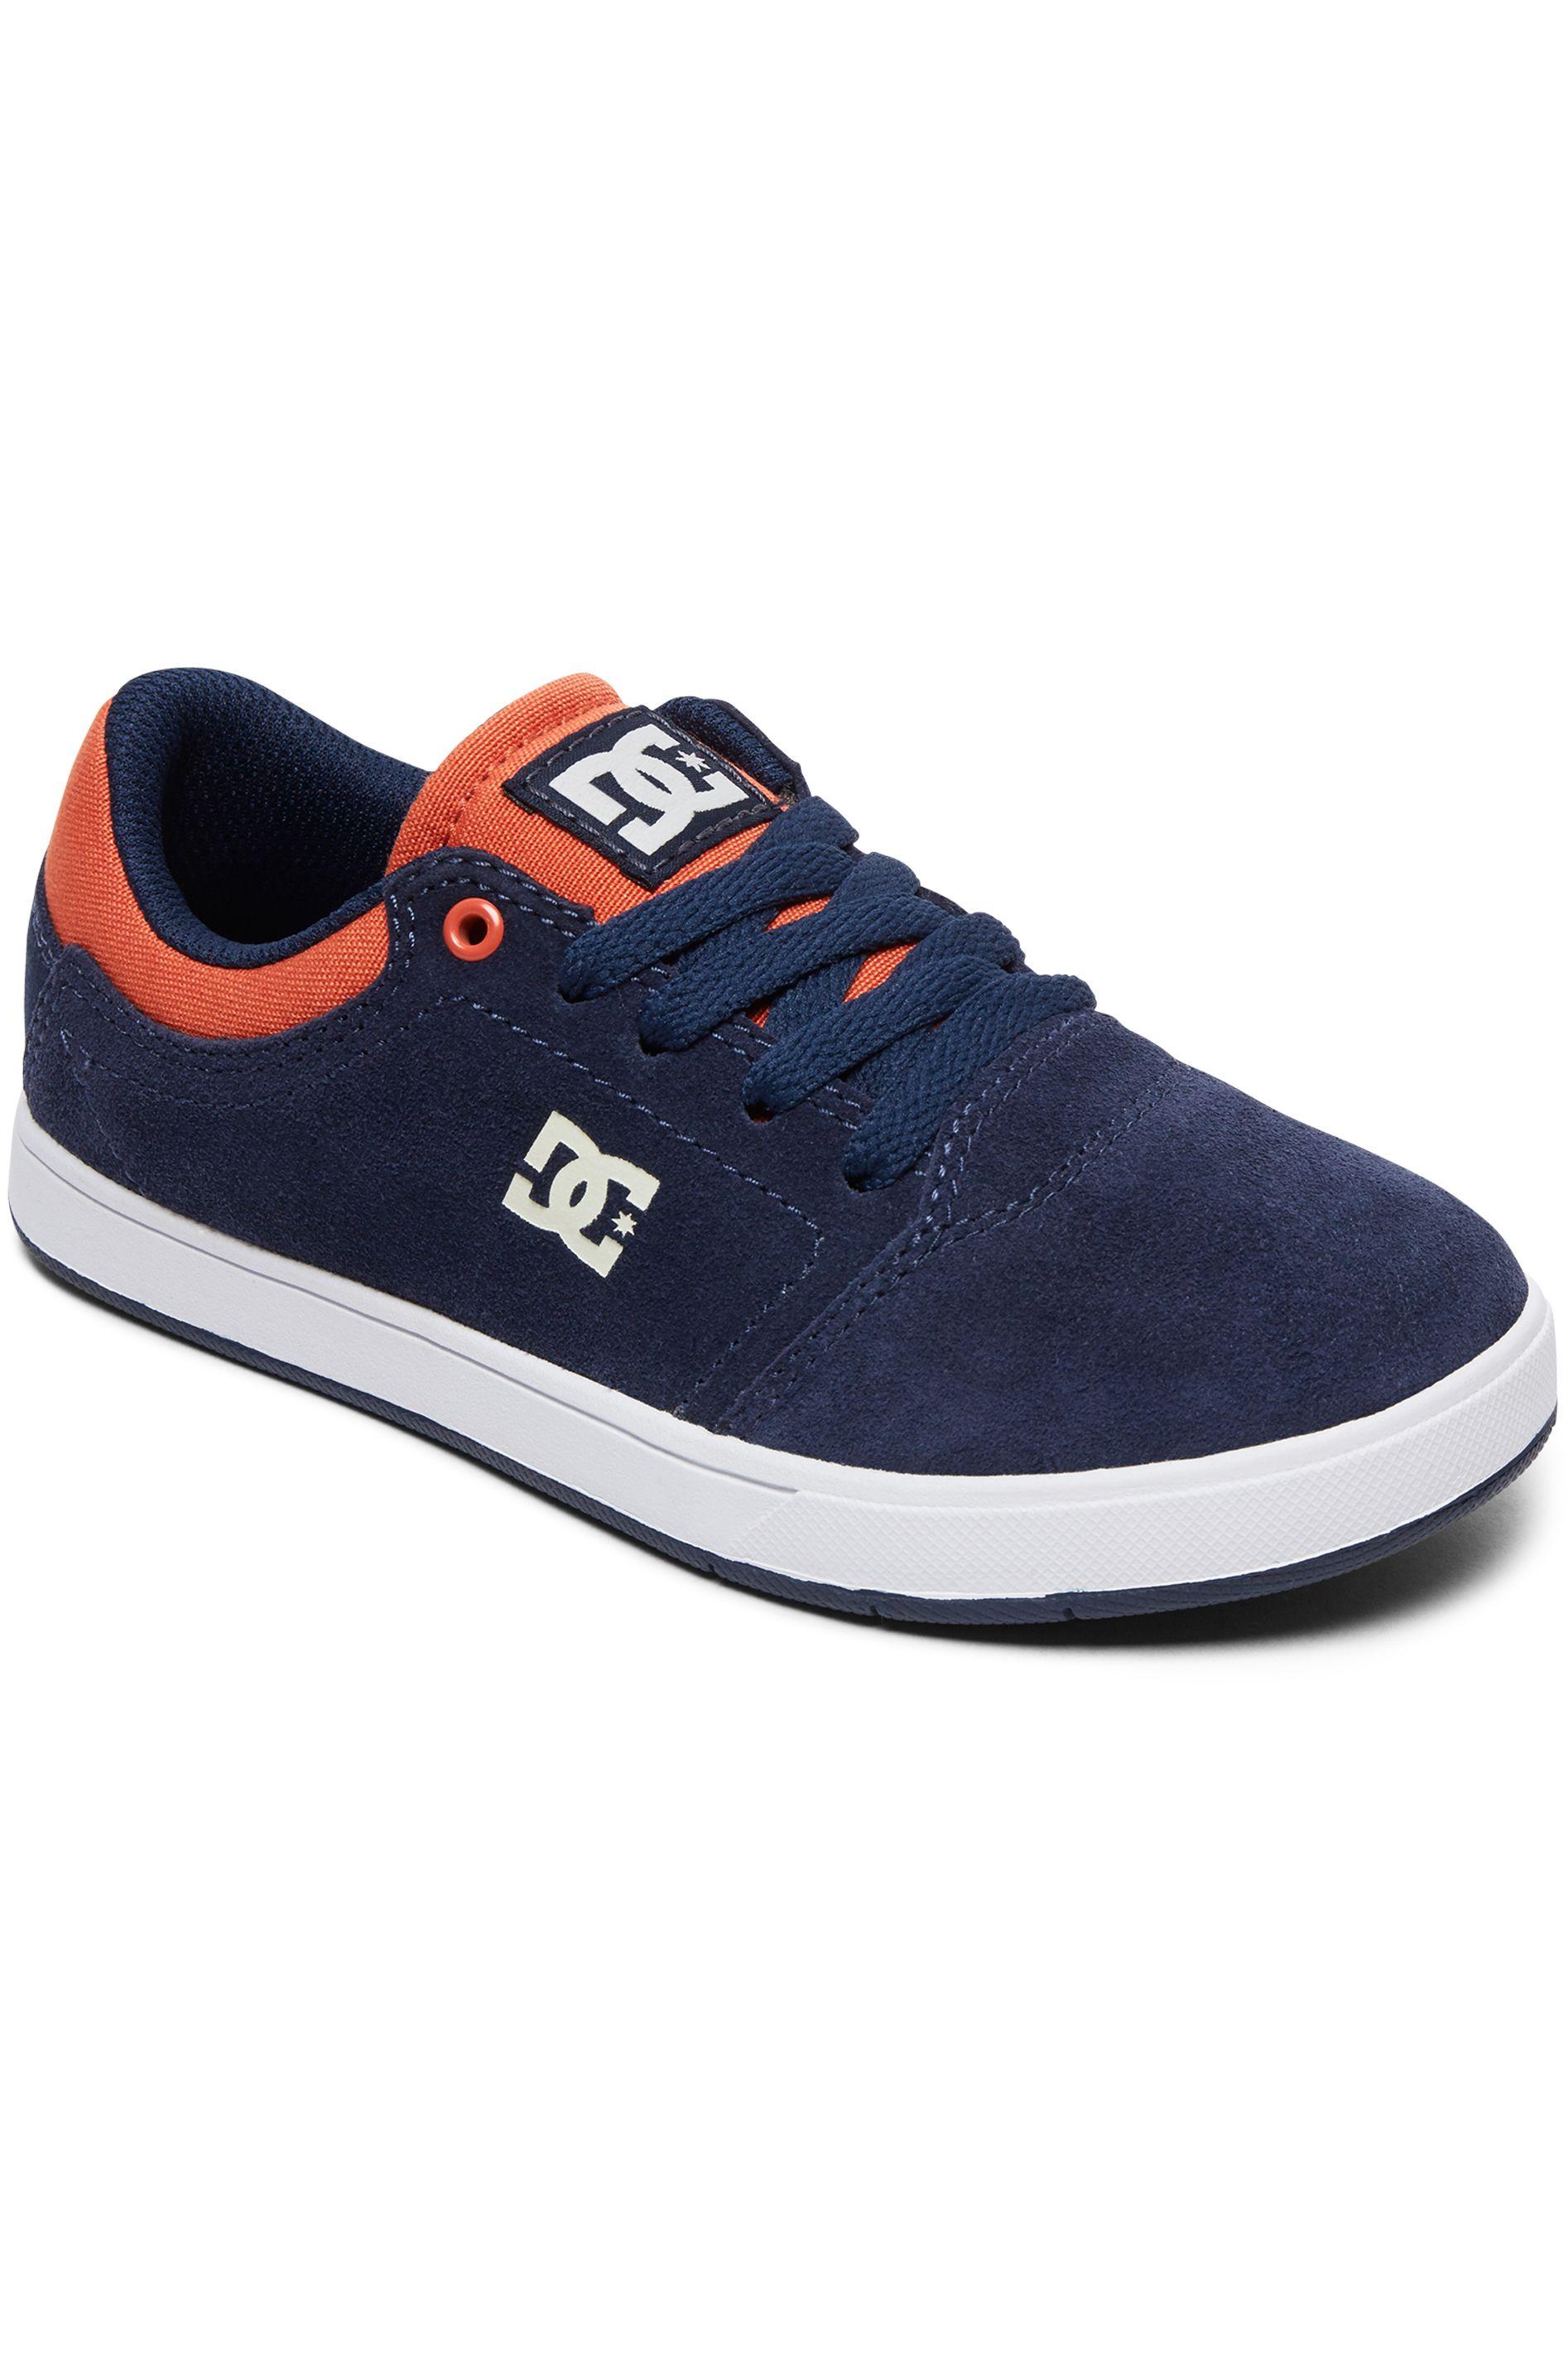 Tenis DC Shoes CRISIS Indigo